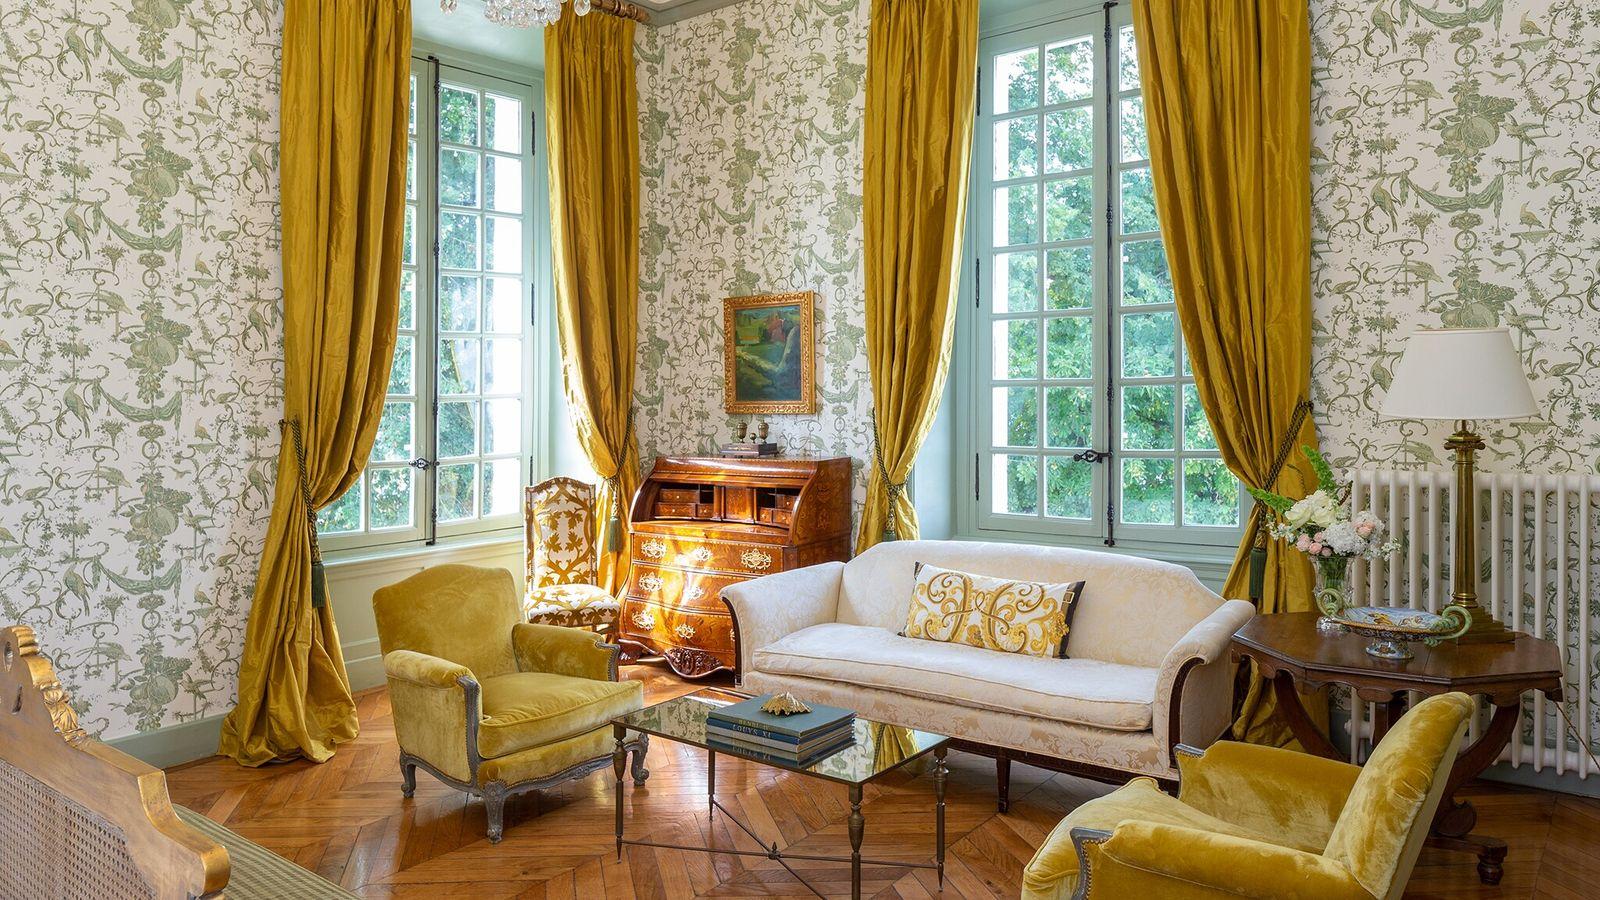 The Corner King Suite at Hotel Château du Grand-Lucé has views out towards an beautiful belle époque-style ...